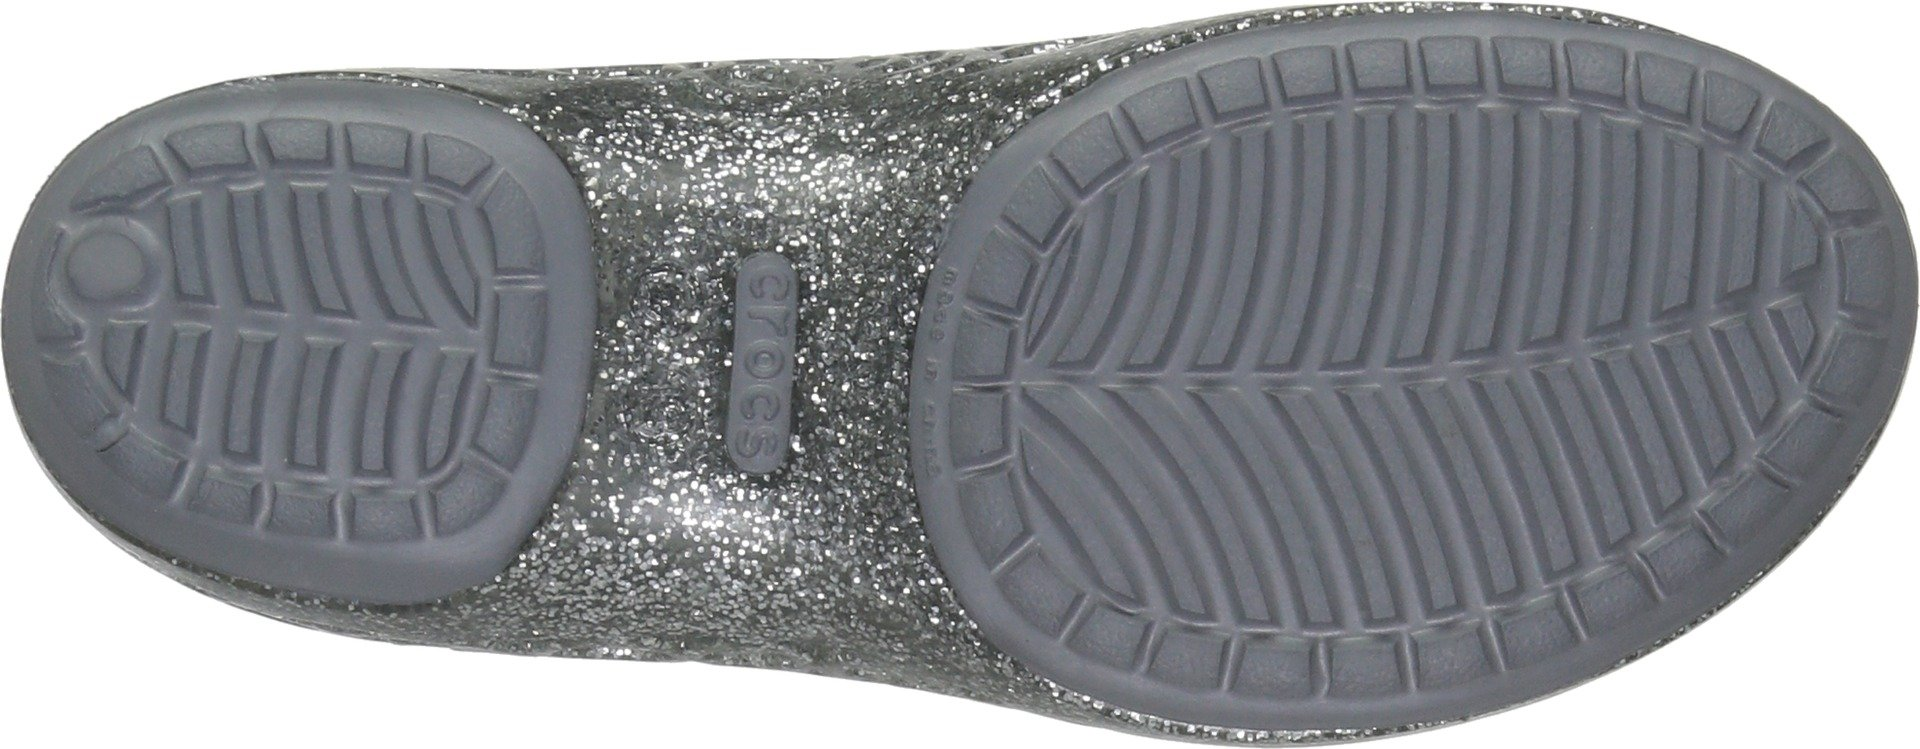 c36ff683f5678 Crocs Girls' Isabella Glitter PS Ballet Flat, Silver, 10 M US Little Kid -  202602-40-10 M US Little Kid < Flats < Clothing, Shoes & Jewelry - tibs